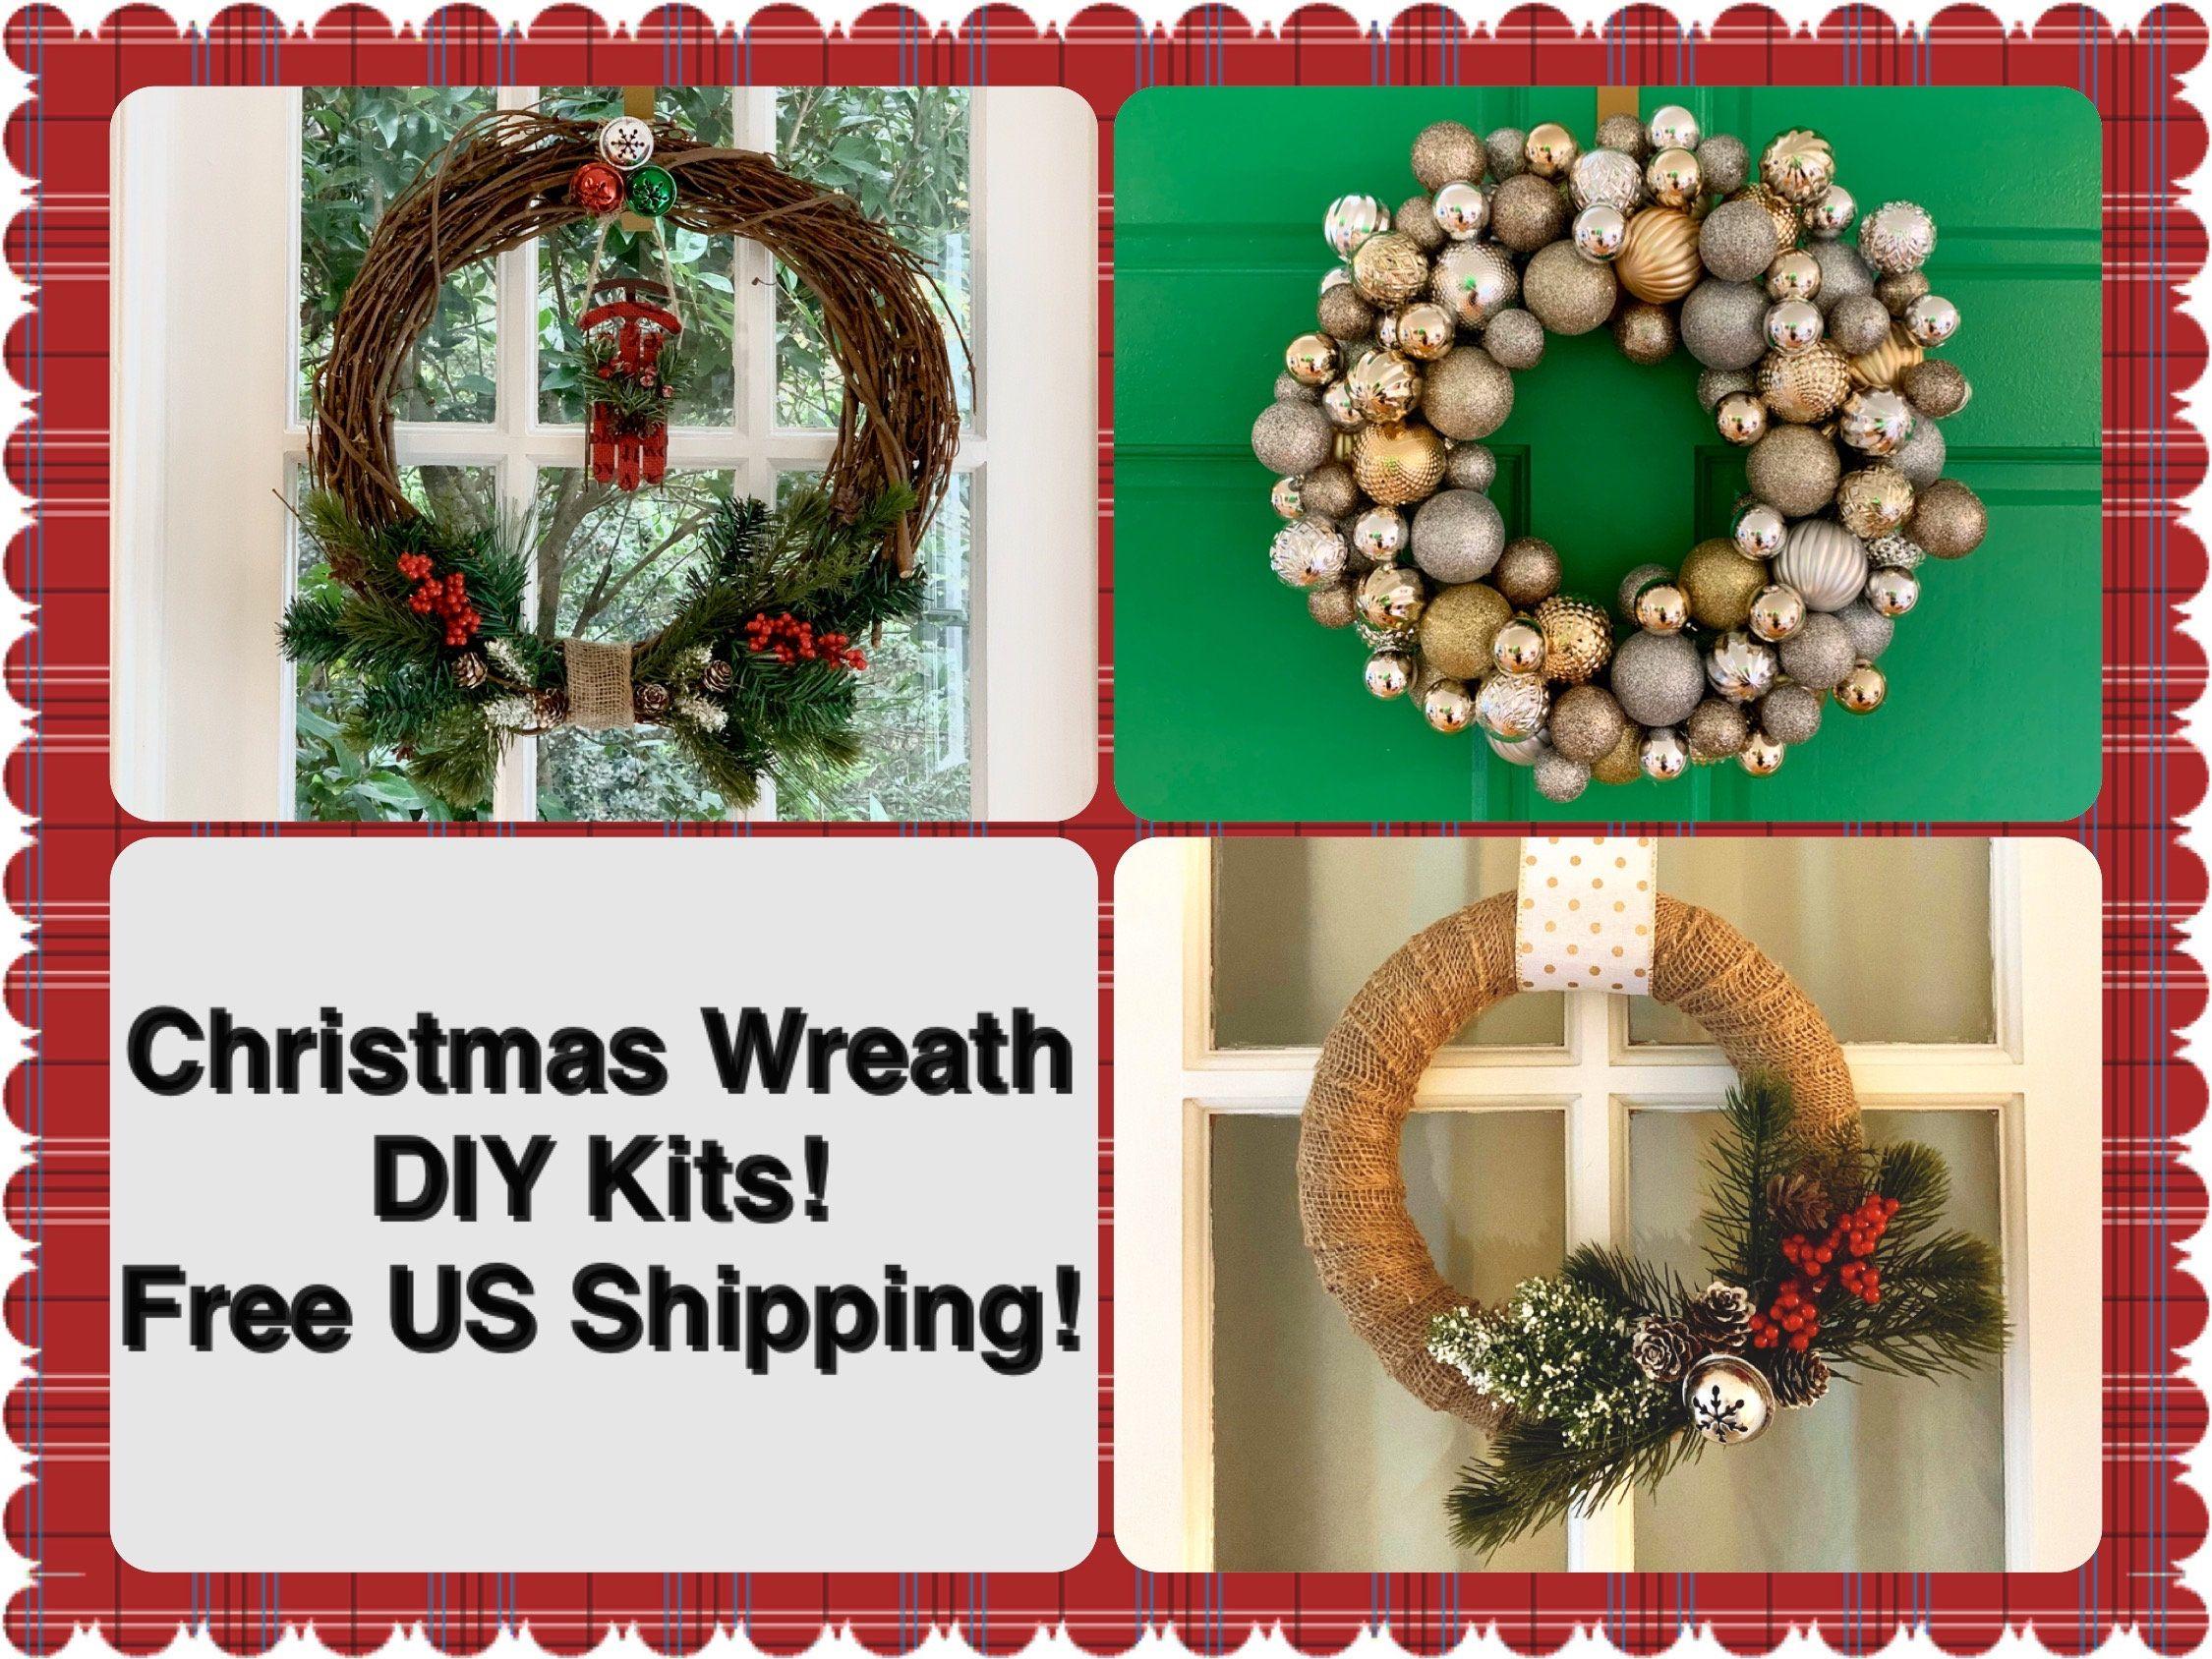 CHRISTMAS WREATH DIY CRAFTING KIT